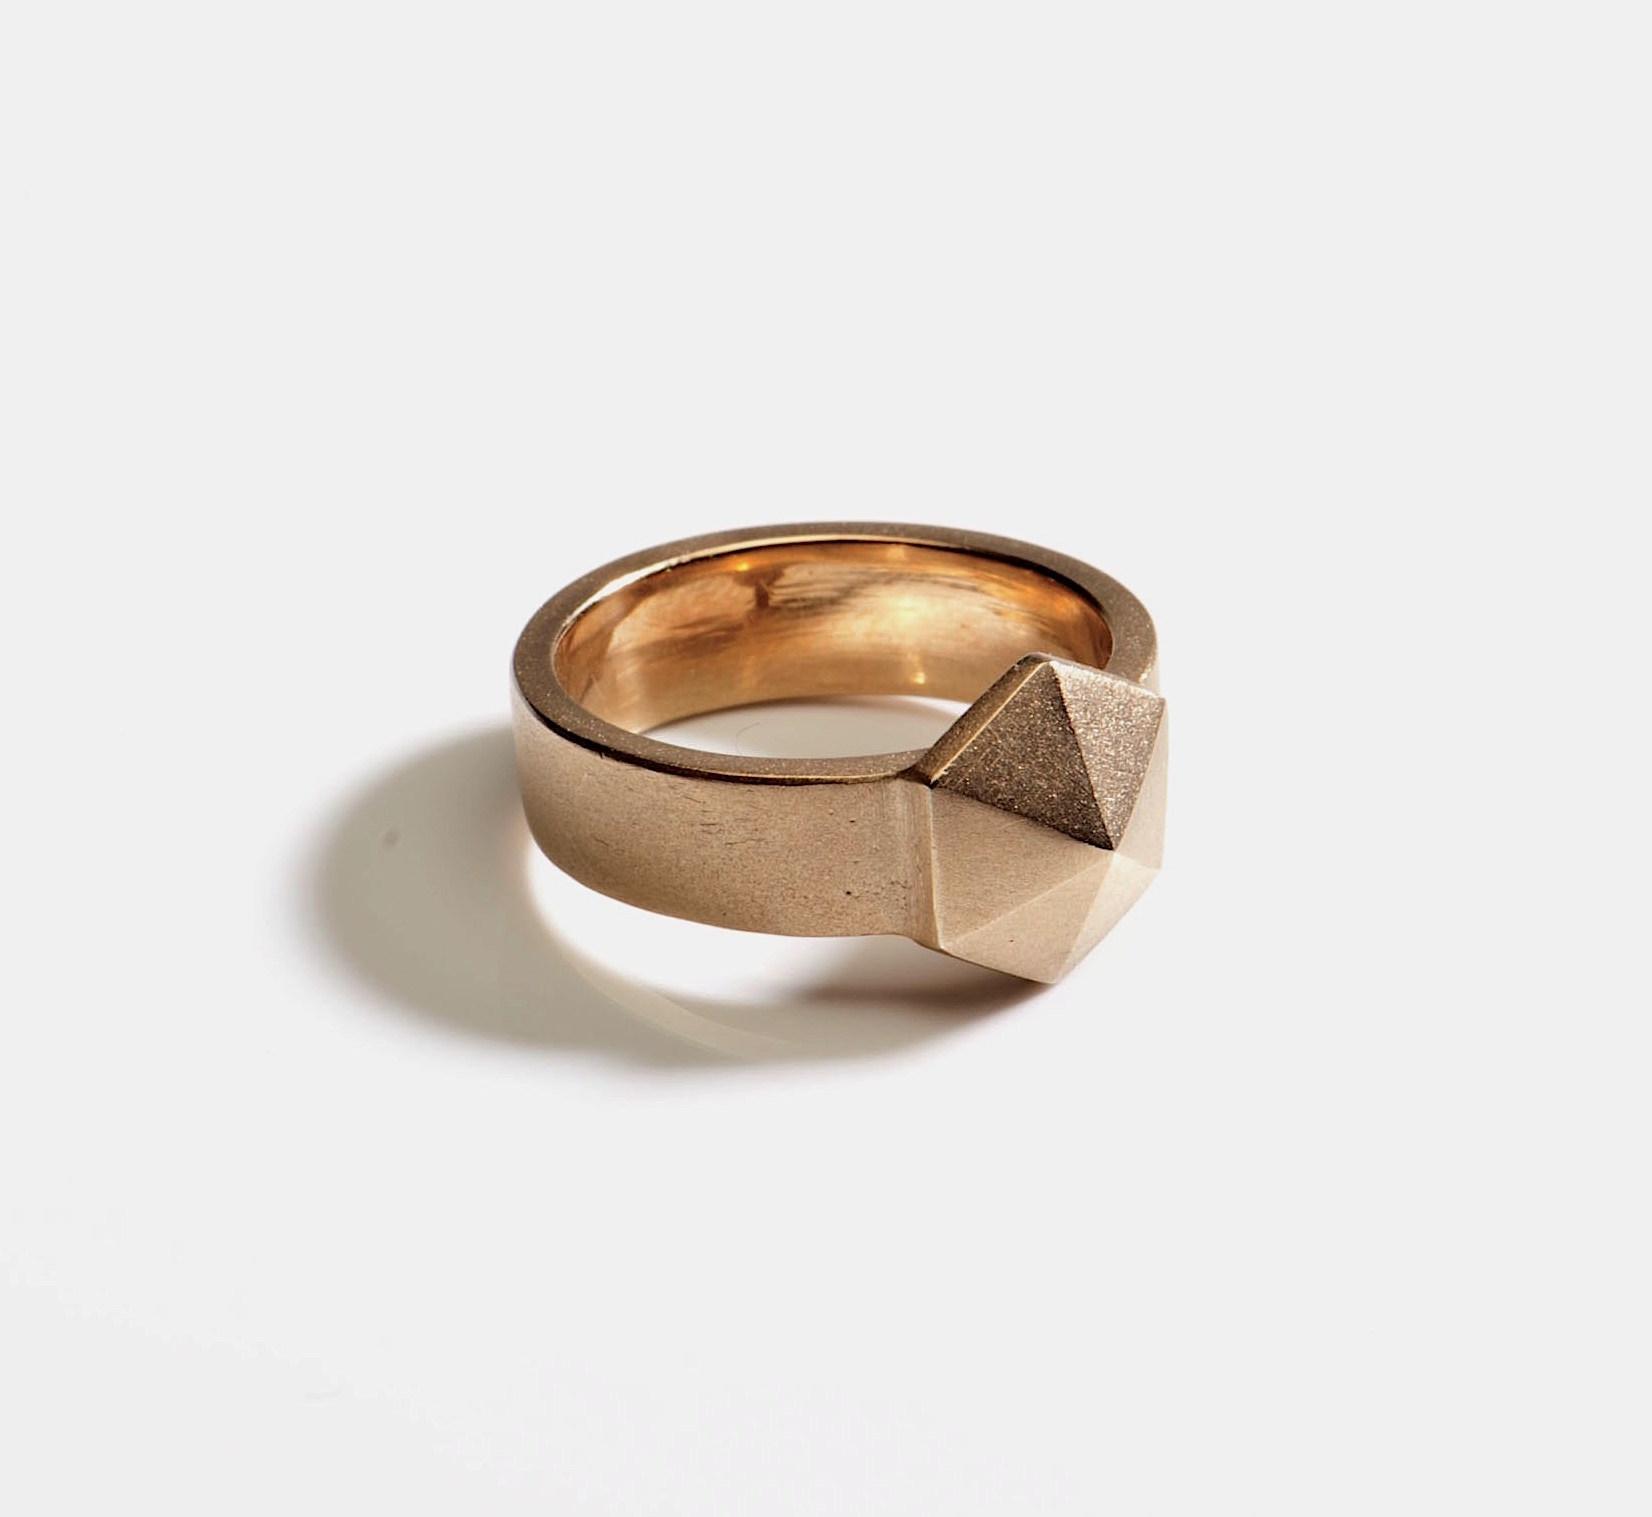 gold band ring silver pyramid stud head.jpg